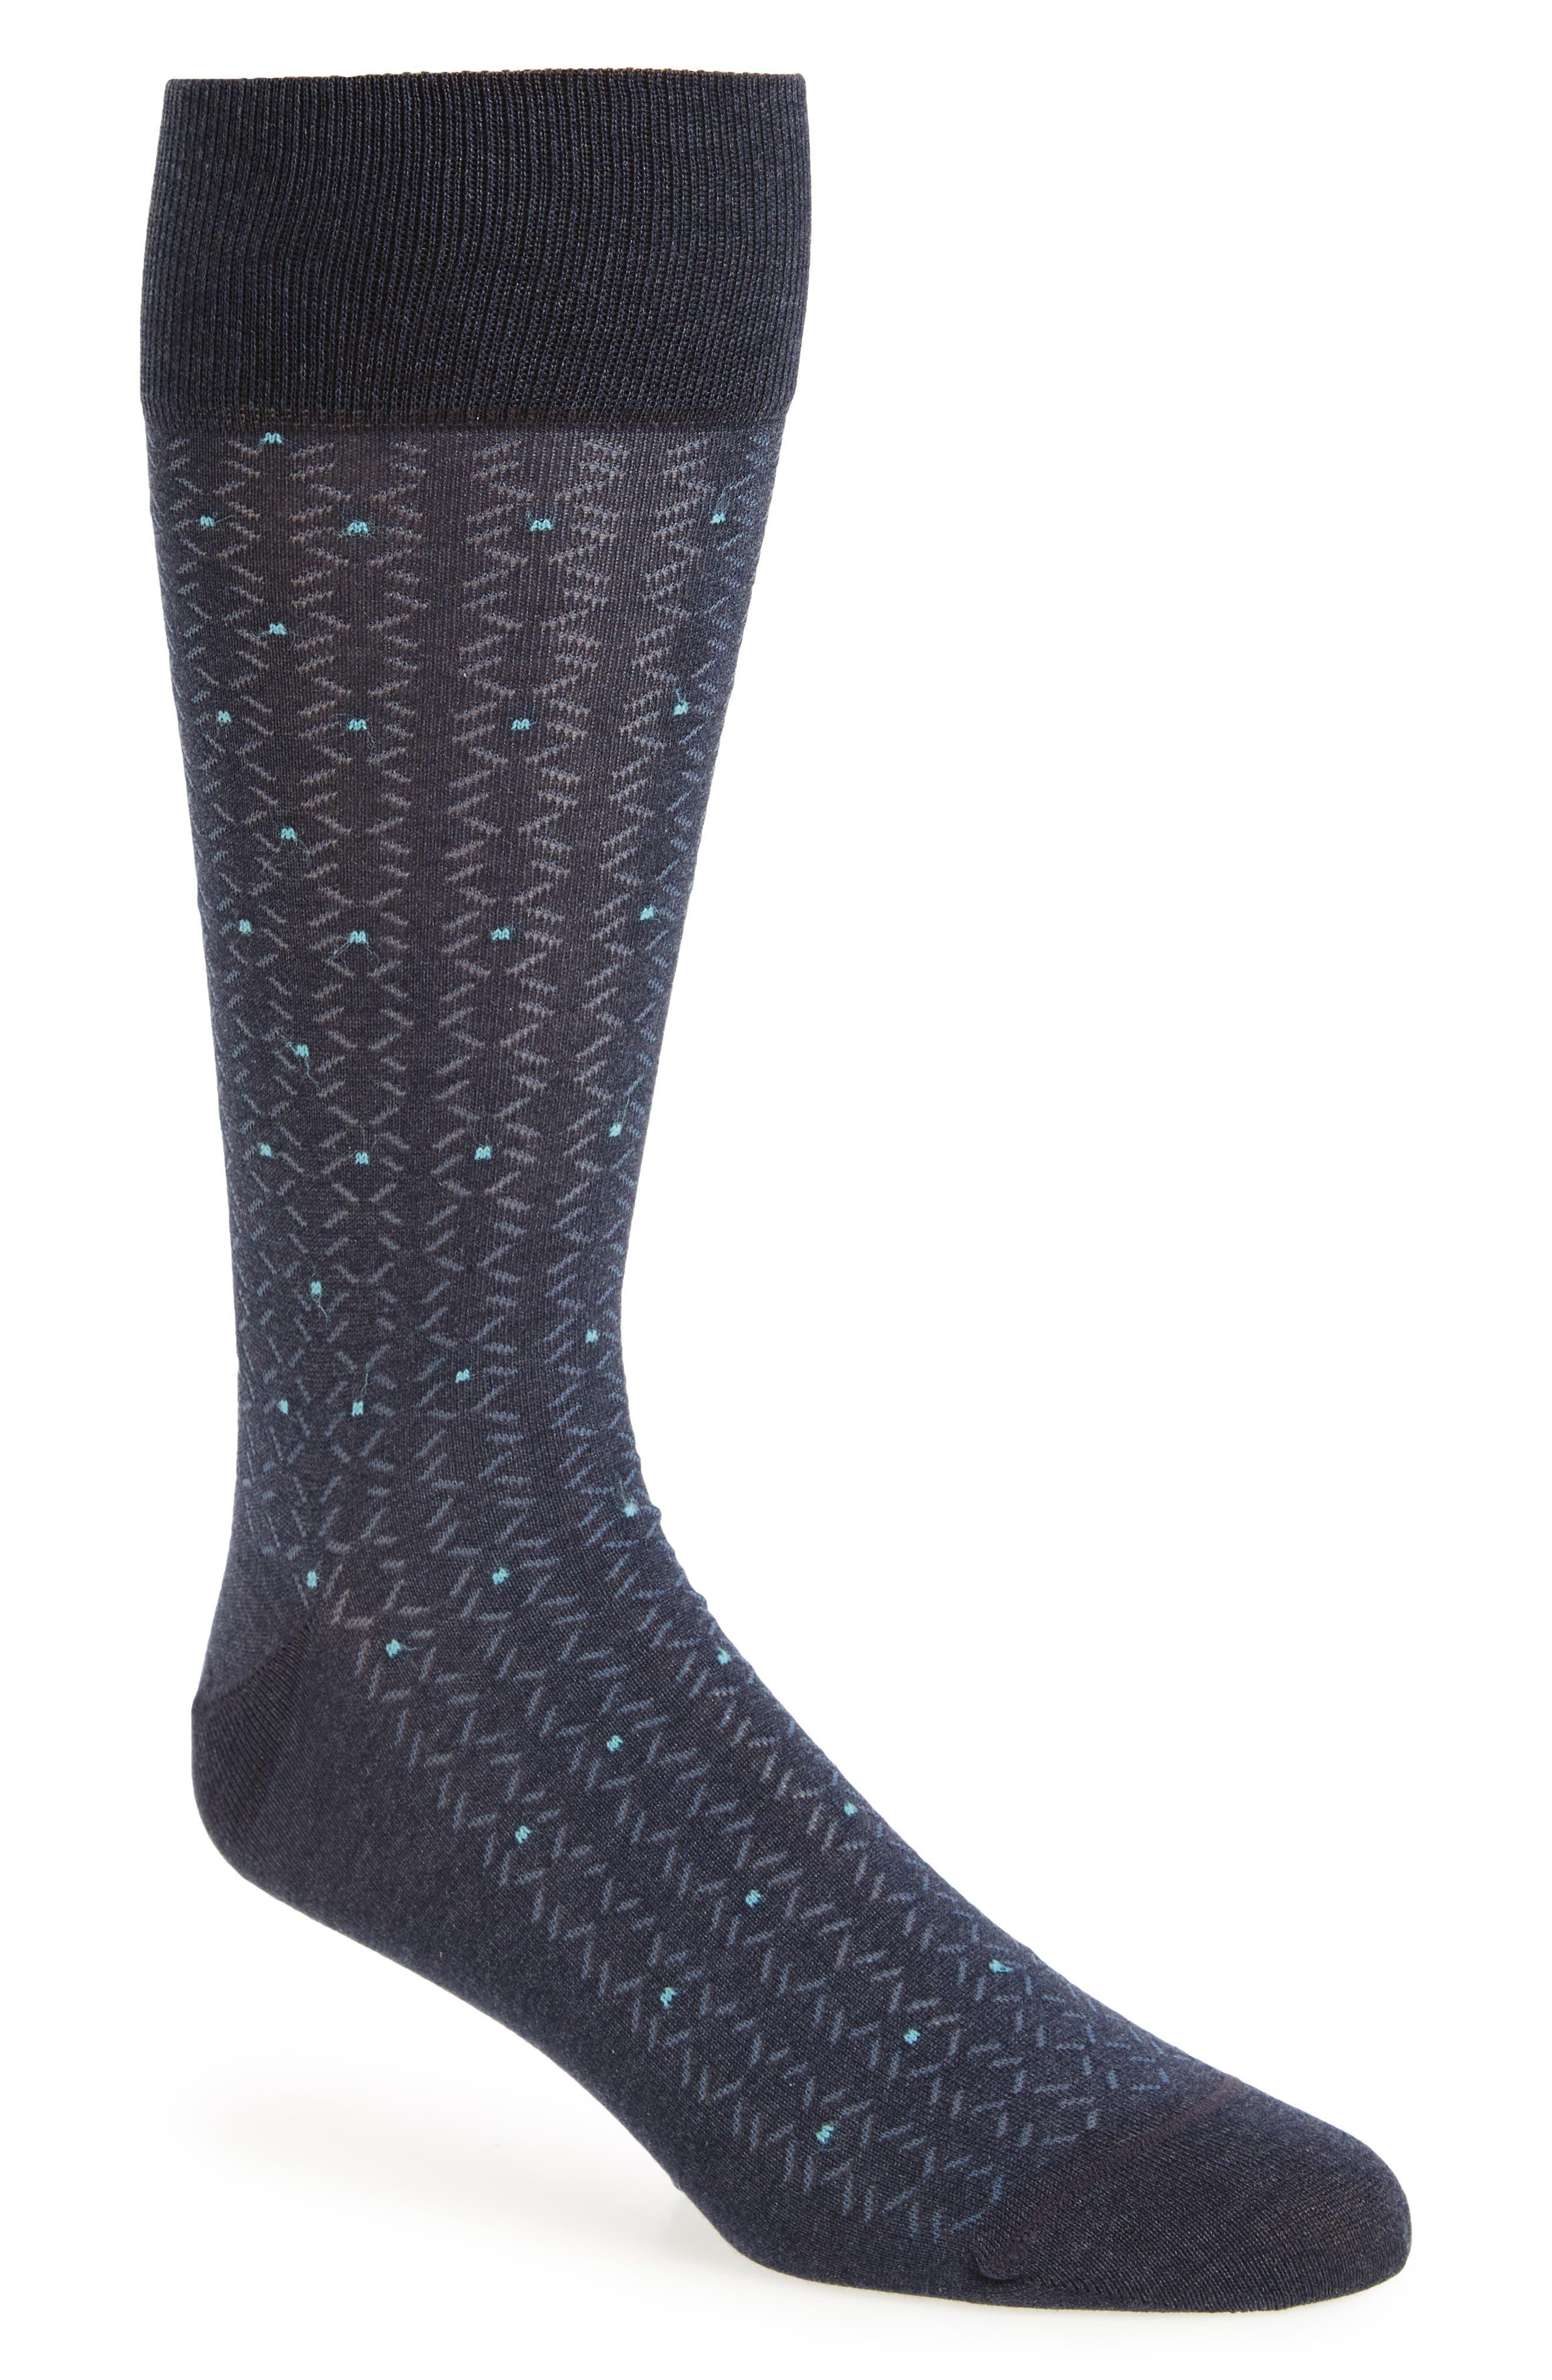 Lattice Points Socks,                         Main,                         color, Navy Heather